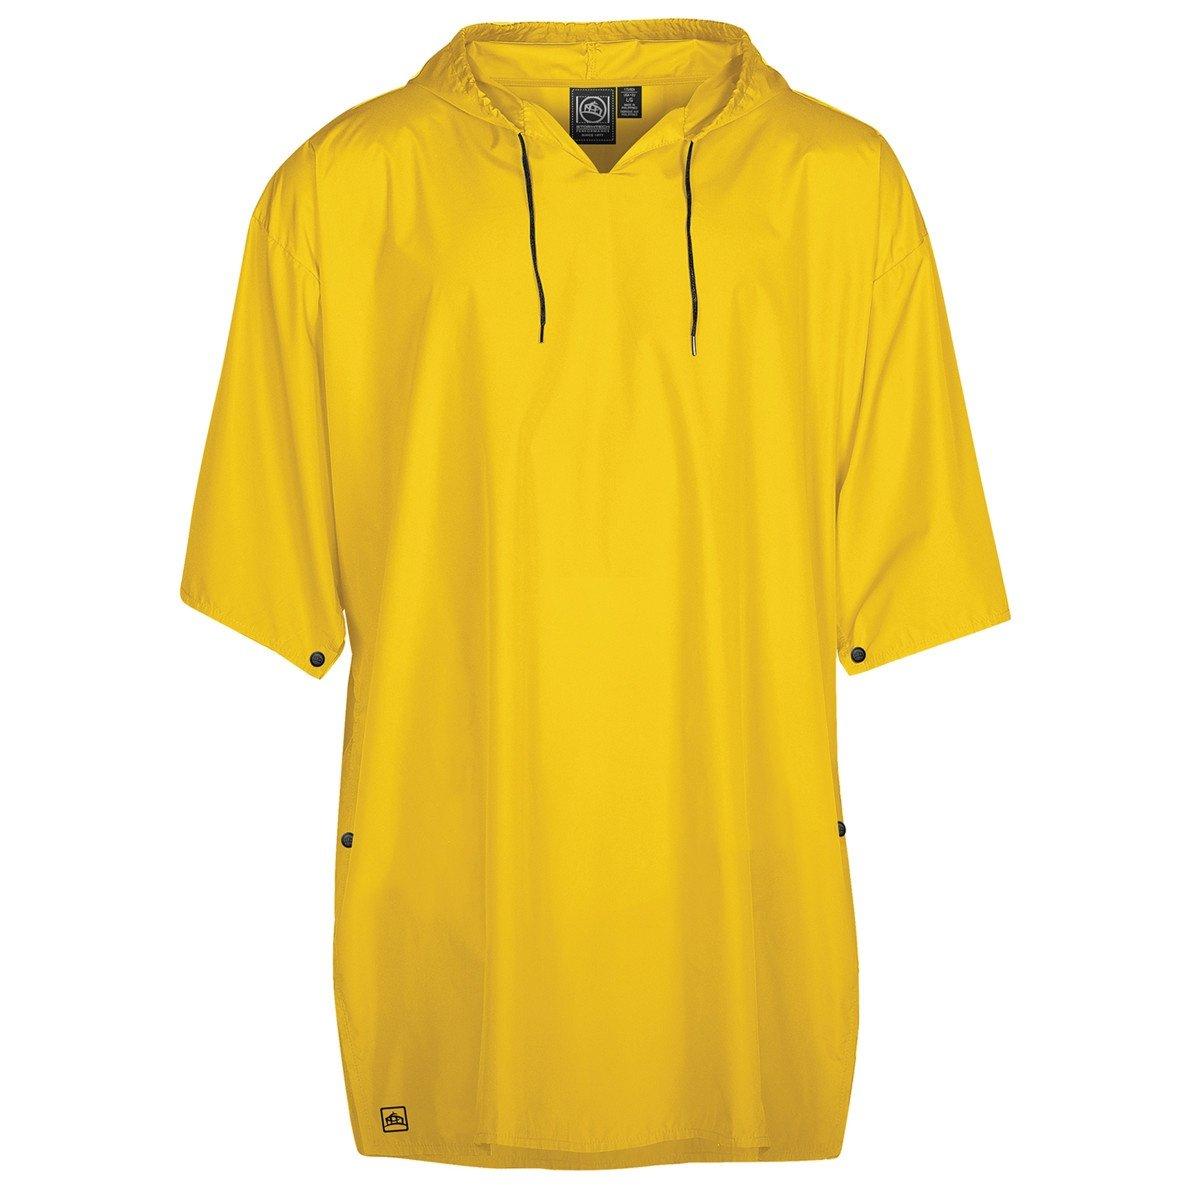 Stormtech Unisex Waterproof Status Snap Fit Rain Poncho (One Size) (Cyber Yellow)